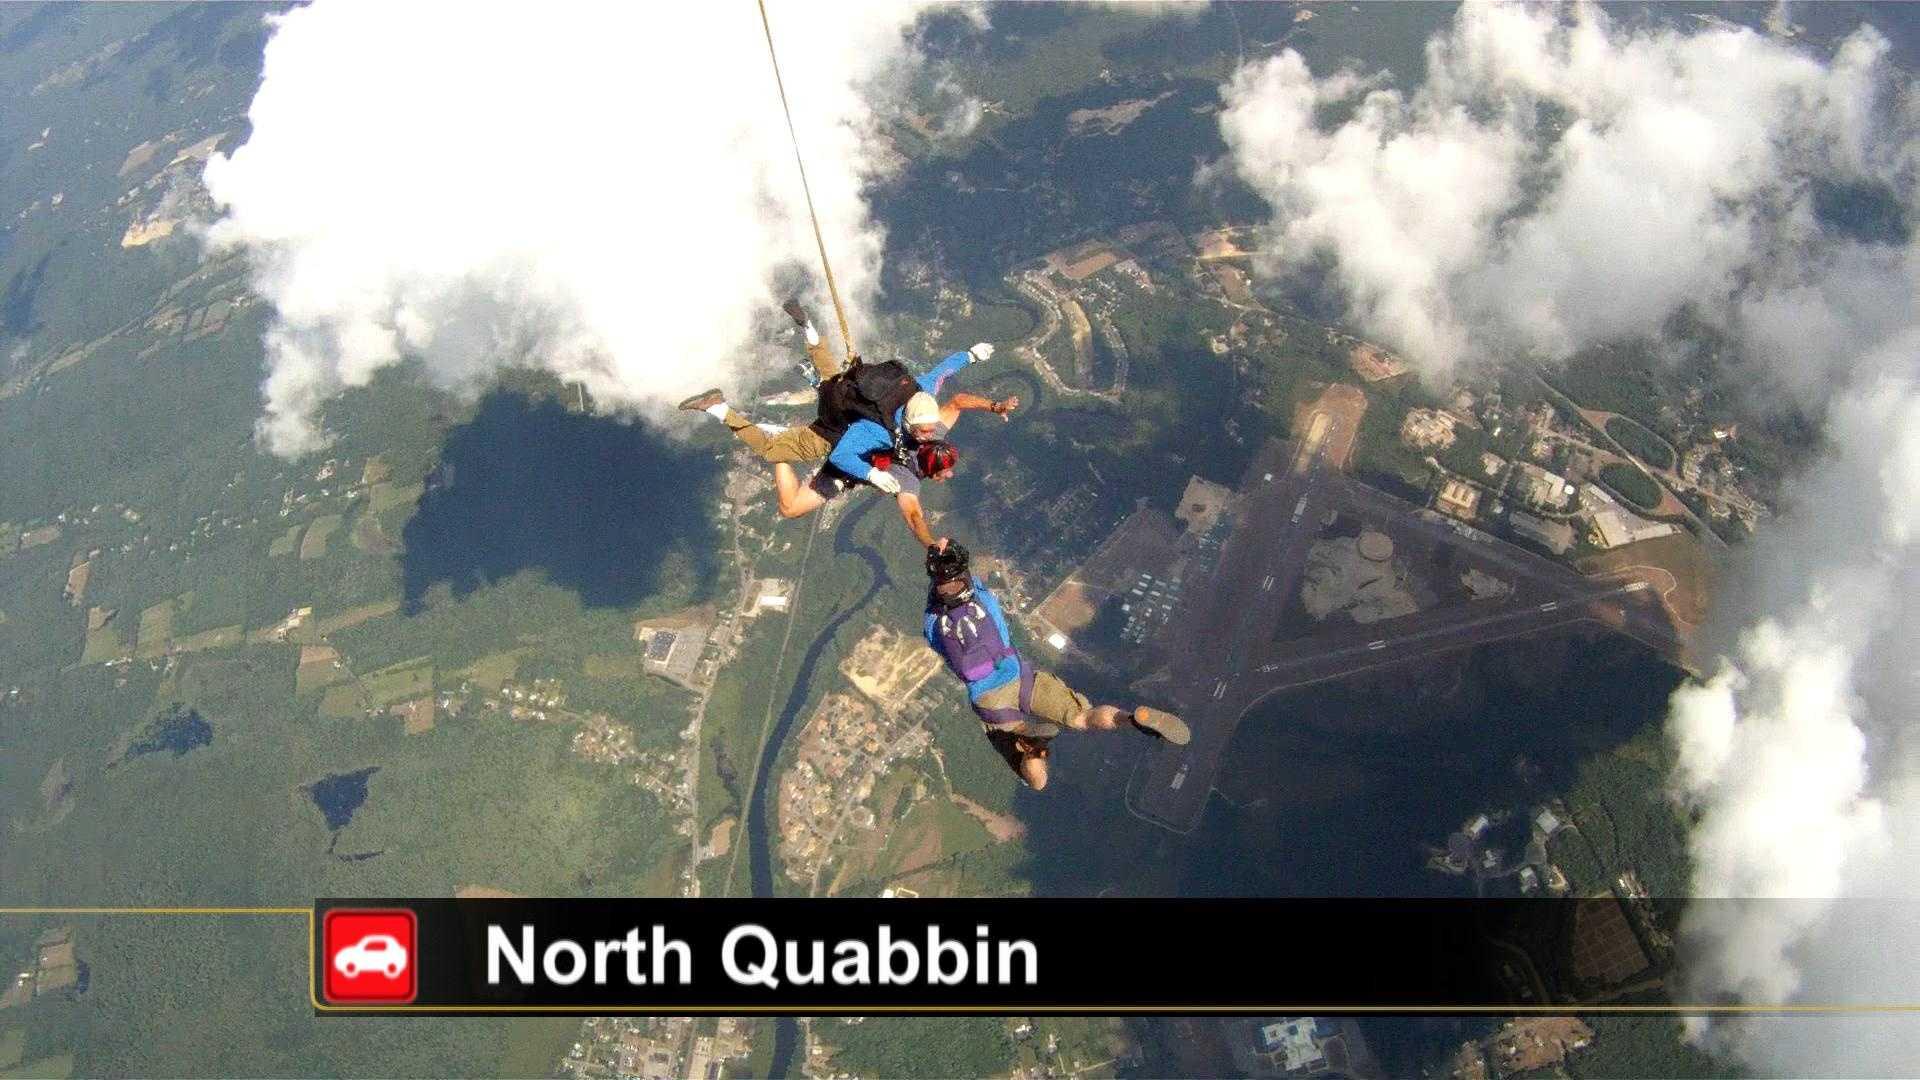 Image: MSBR North Quabbin